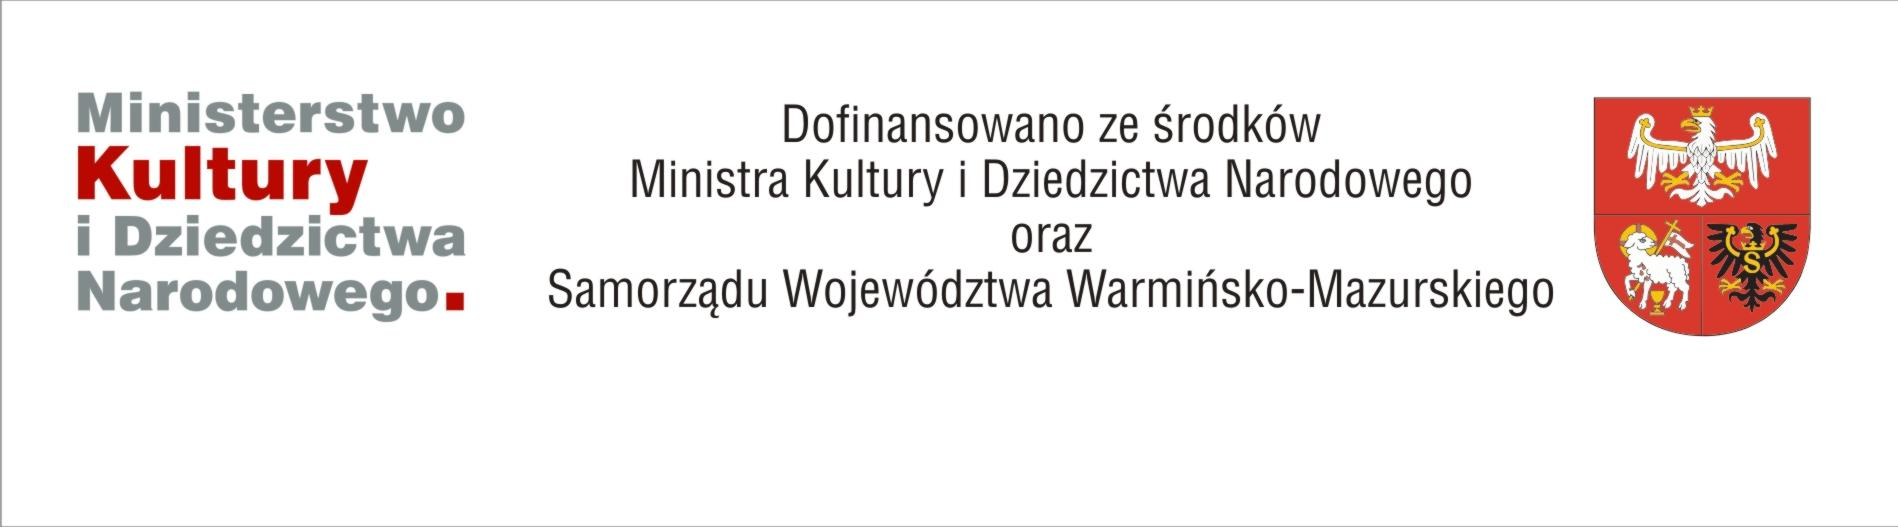 http://m.wmwm.pl/2016/06/orig/belka-z-logami-1-5319.jpg